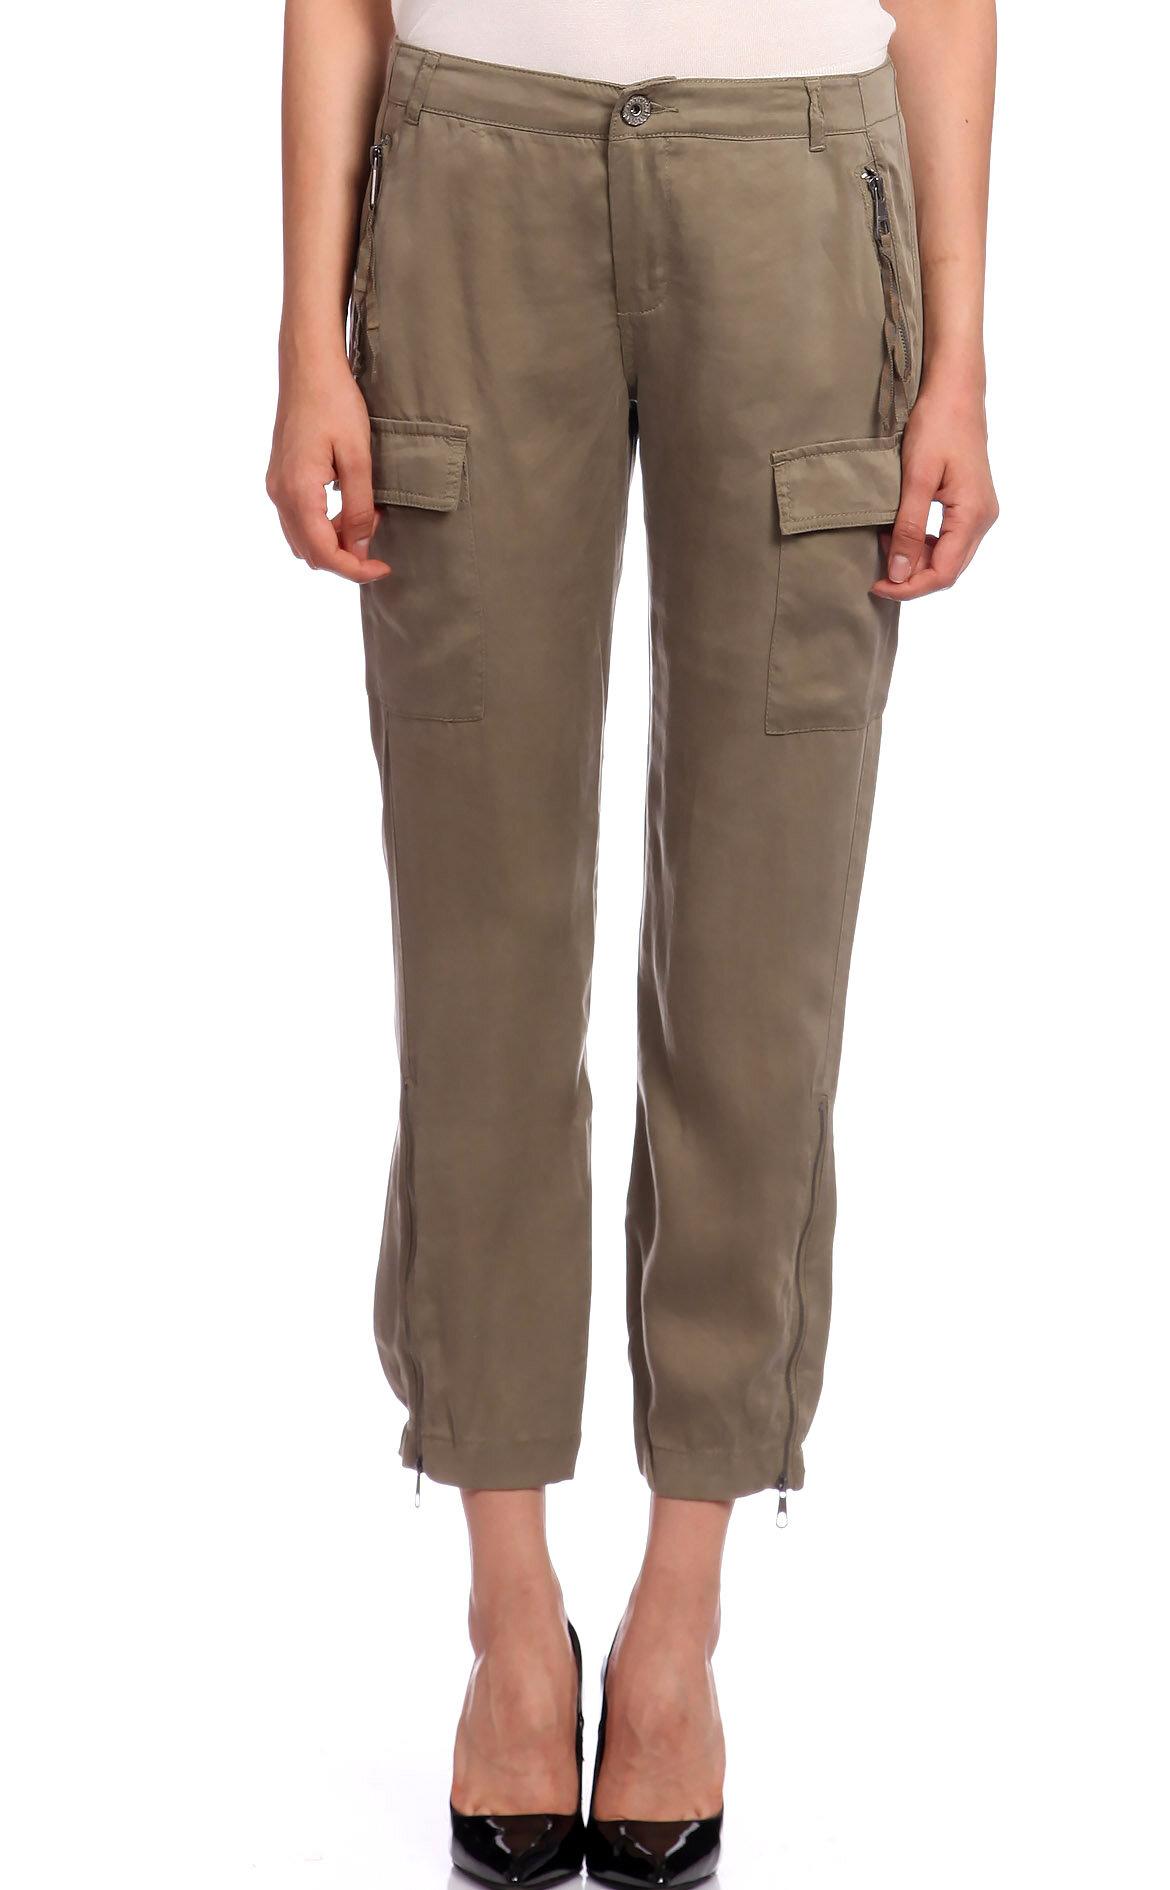 Guess-Guess Pantolon